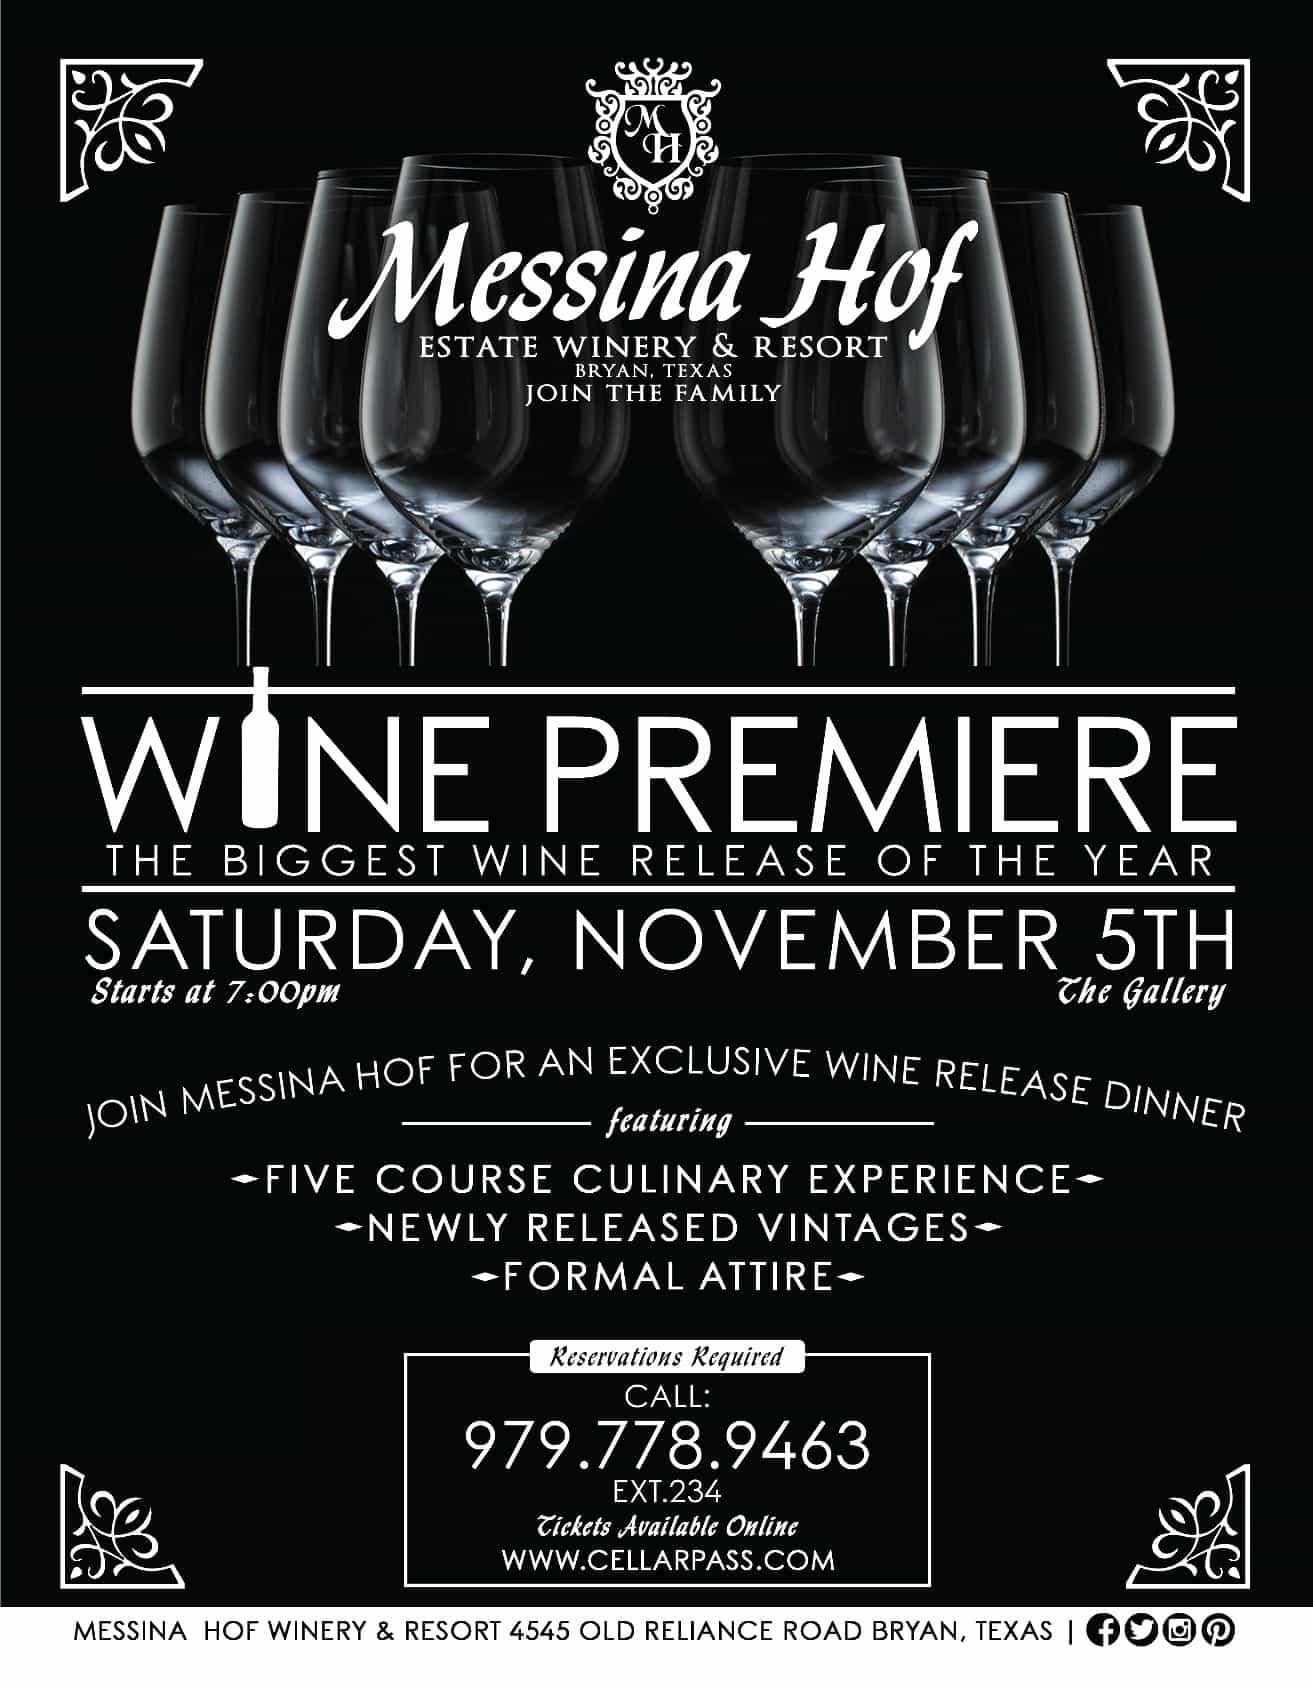 Messina Hof Winery Advertisement